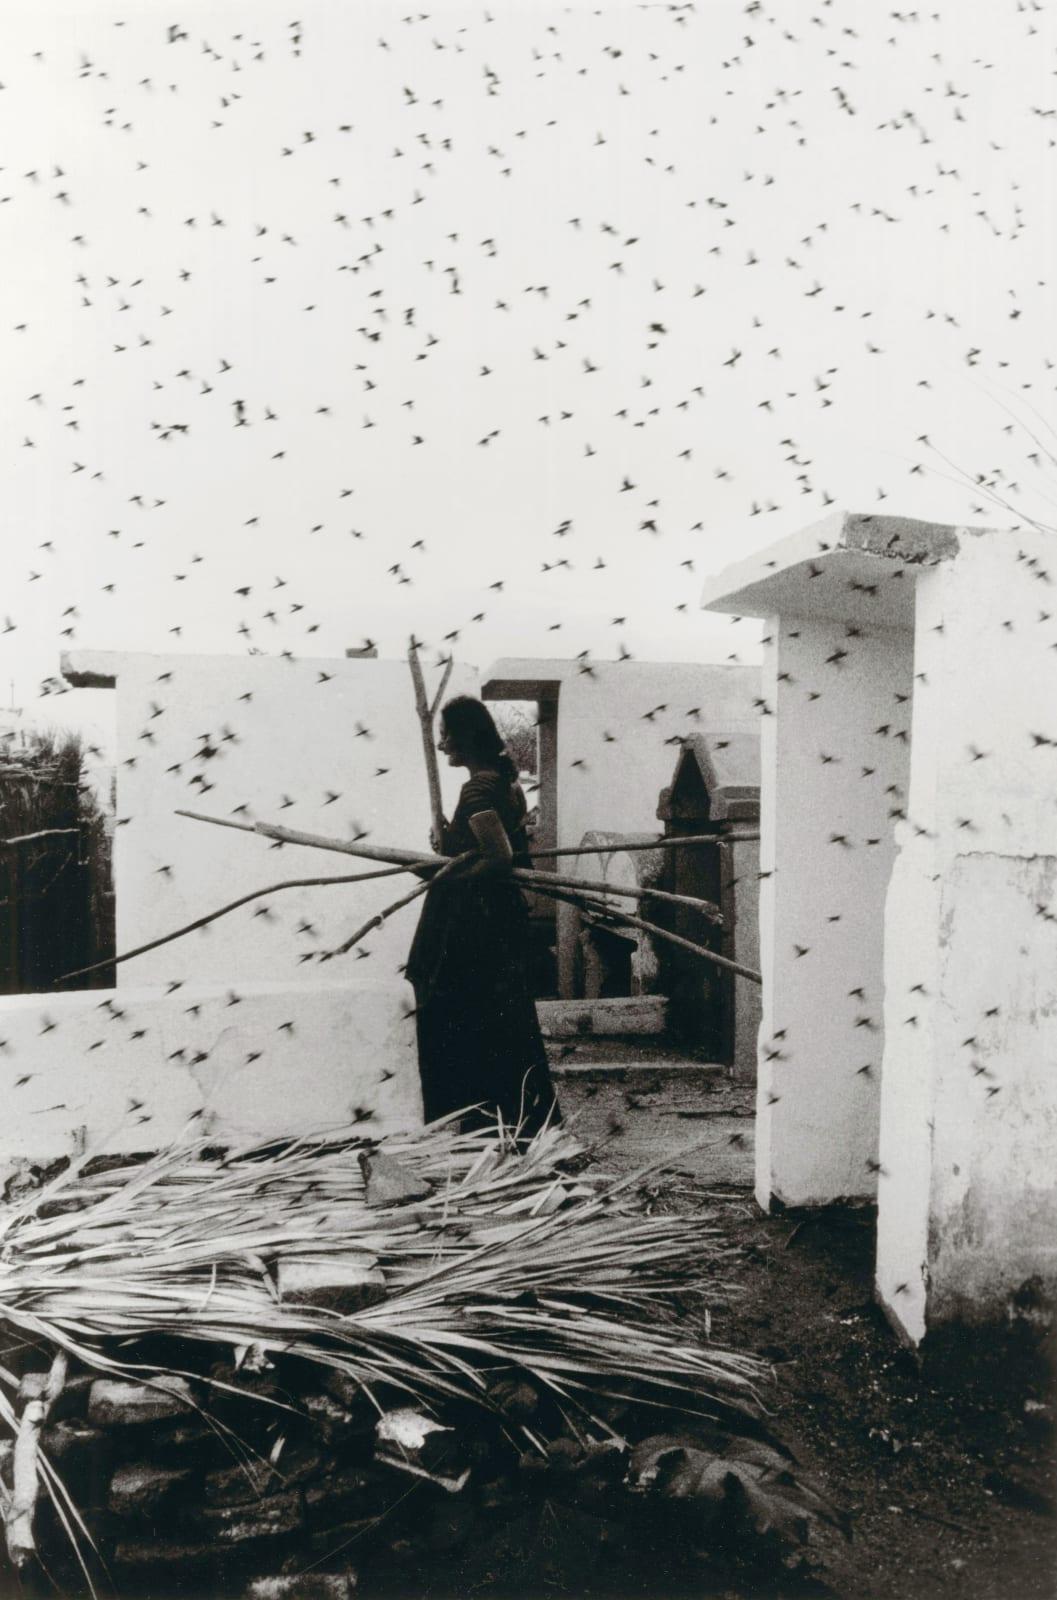 Graciela Iturbide - Cementerio, Juchitán, Oaxaca, 1988